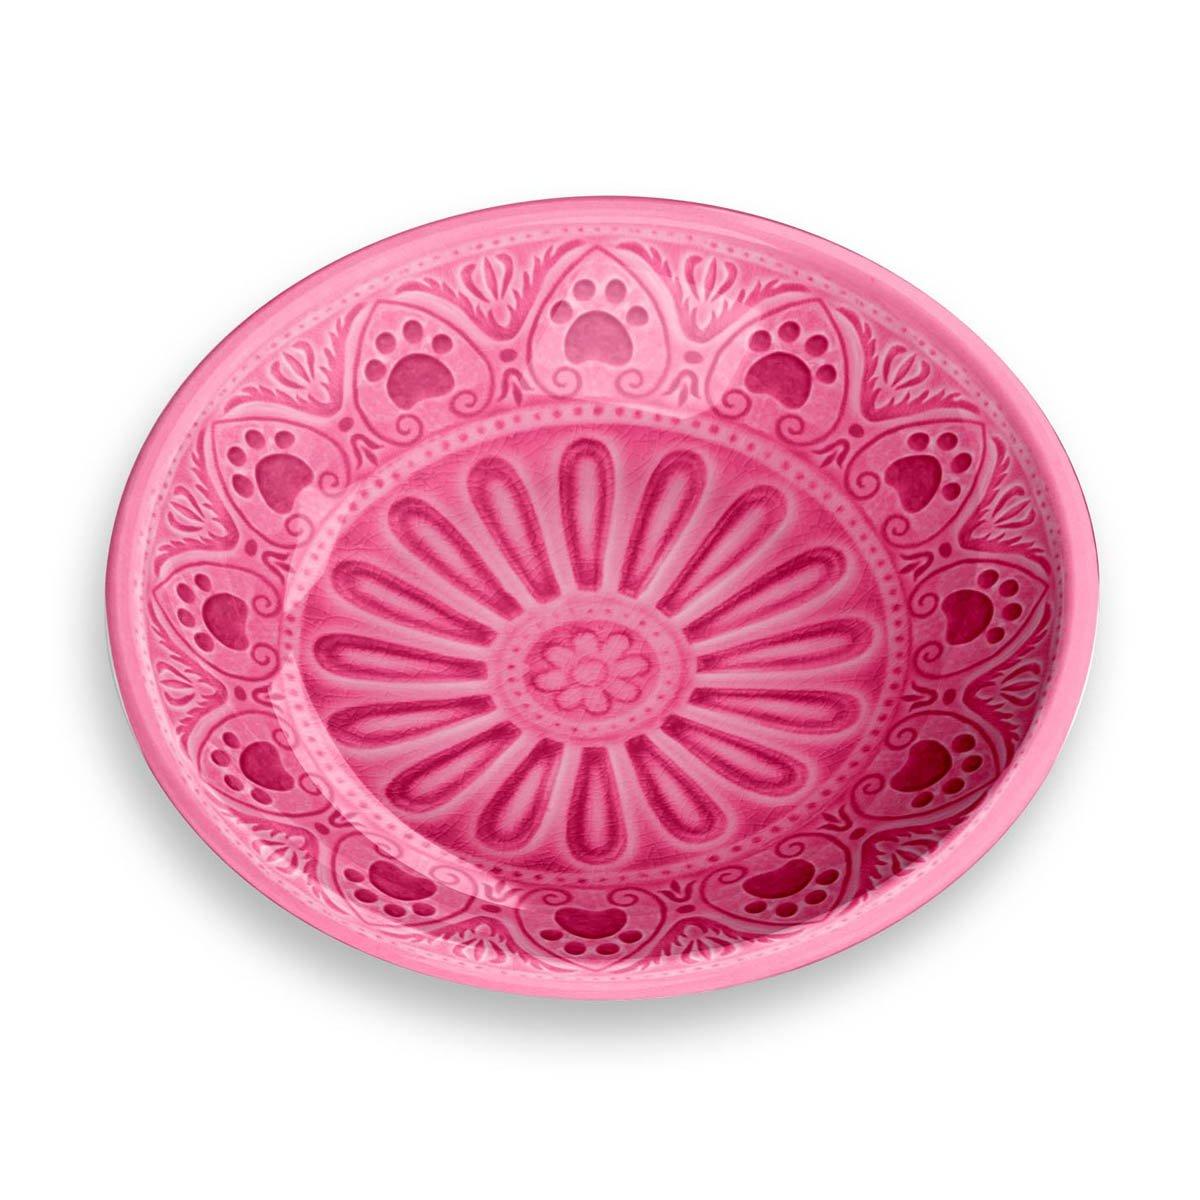 TarHong Medallion Paw Print Saucer, Pink